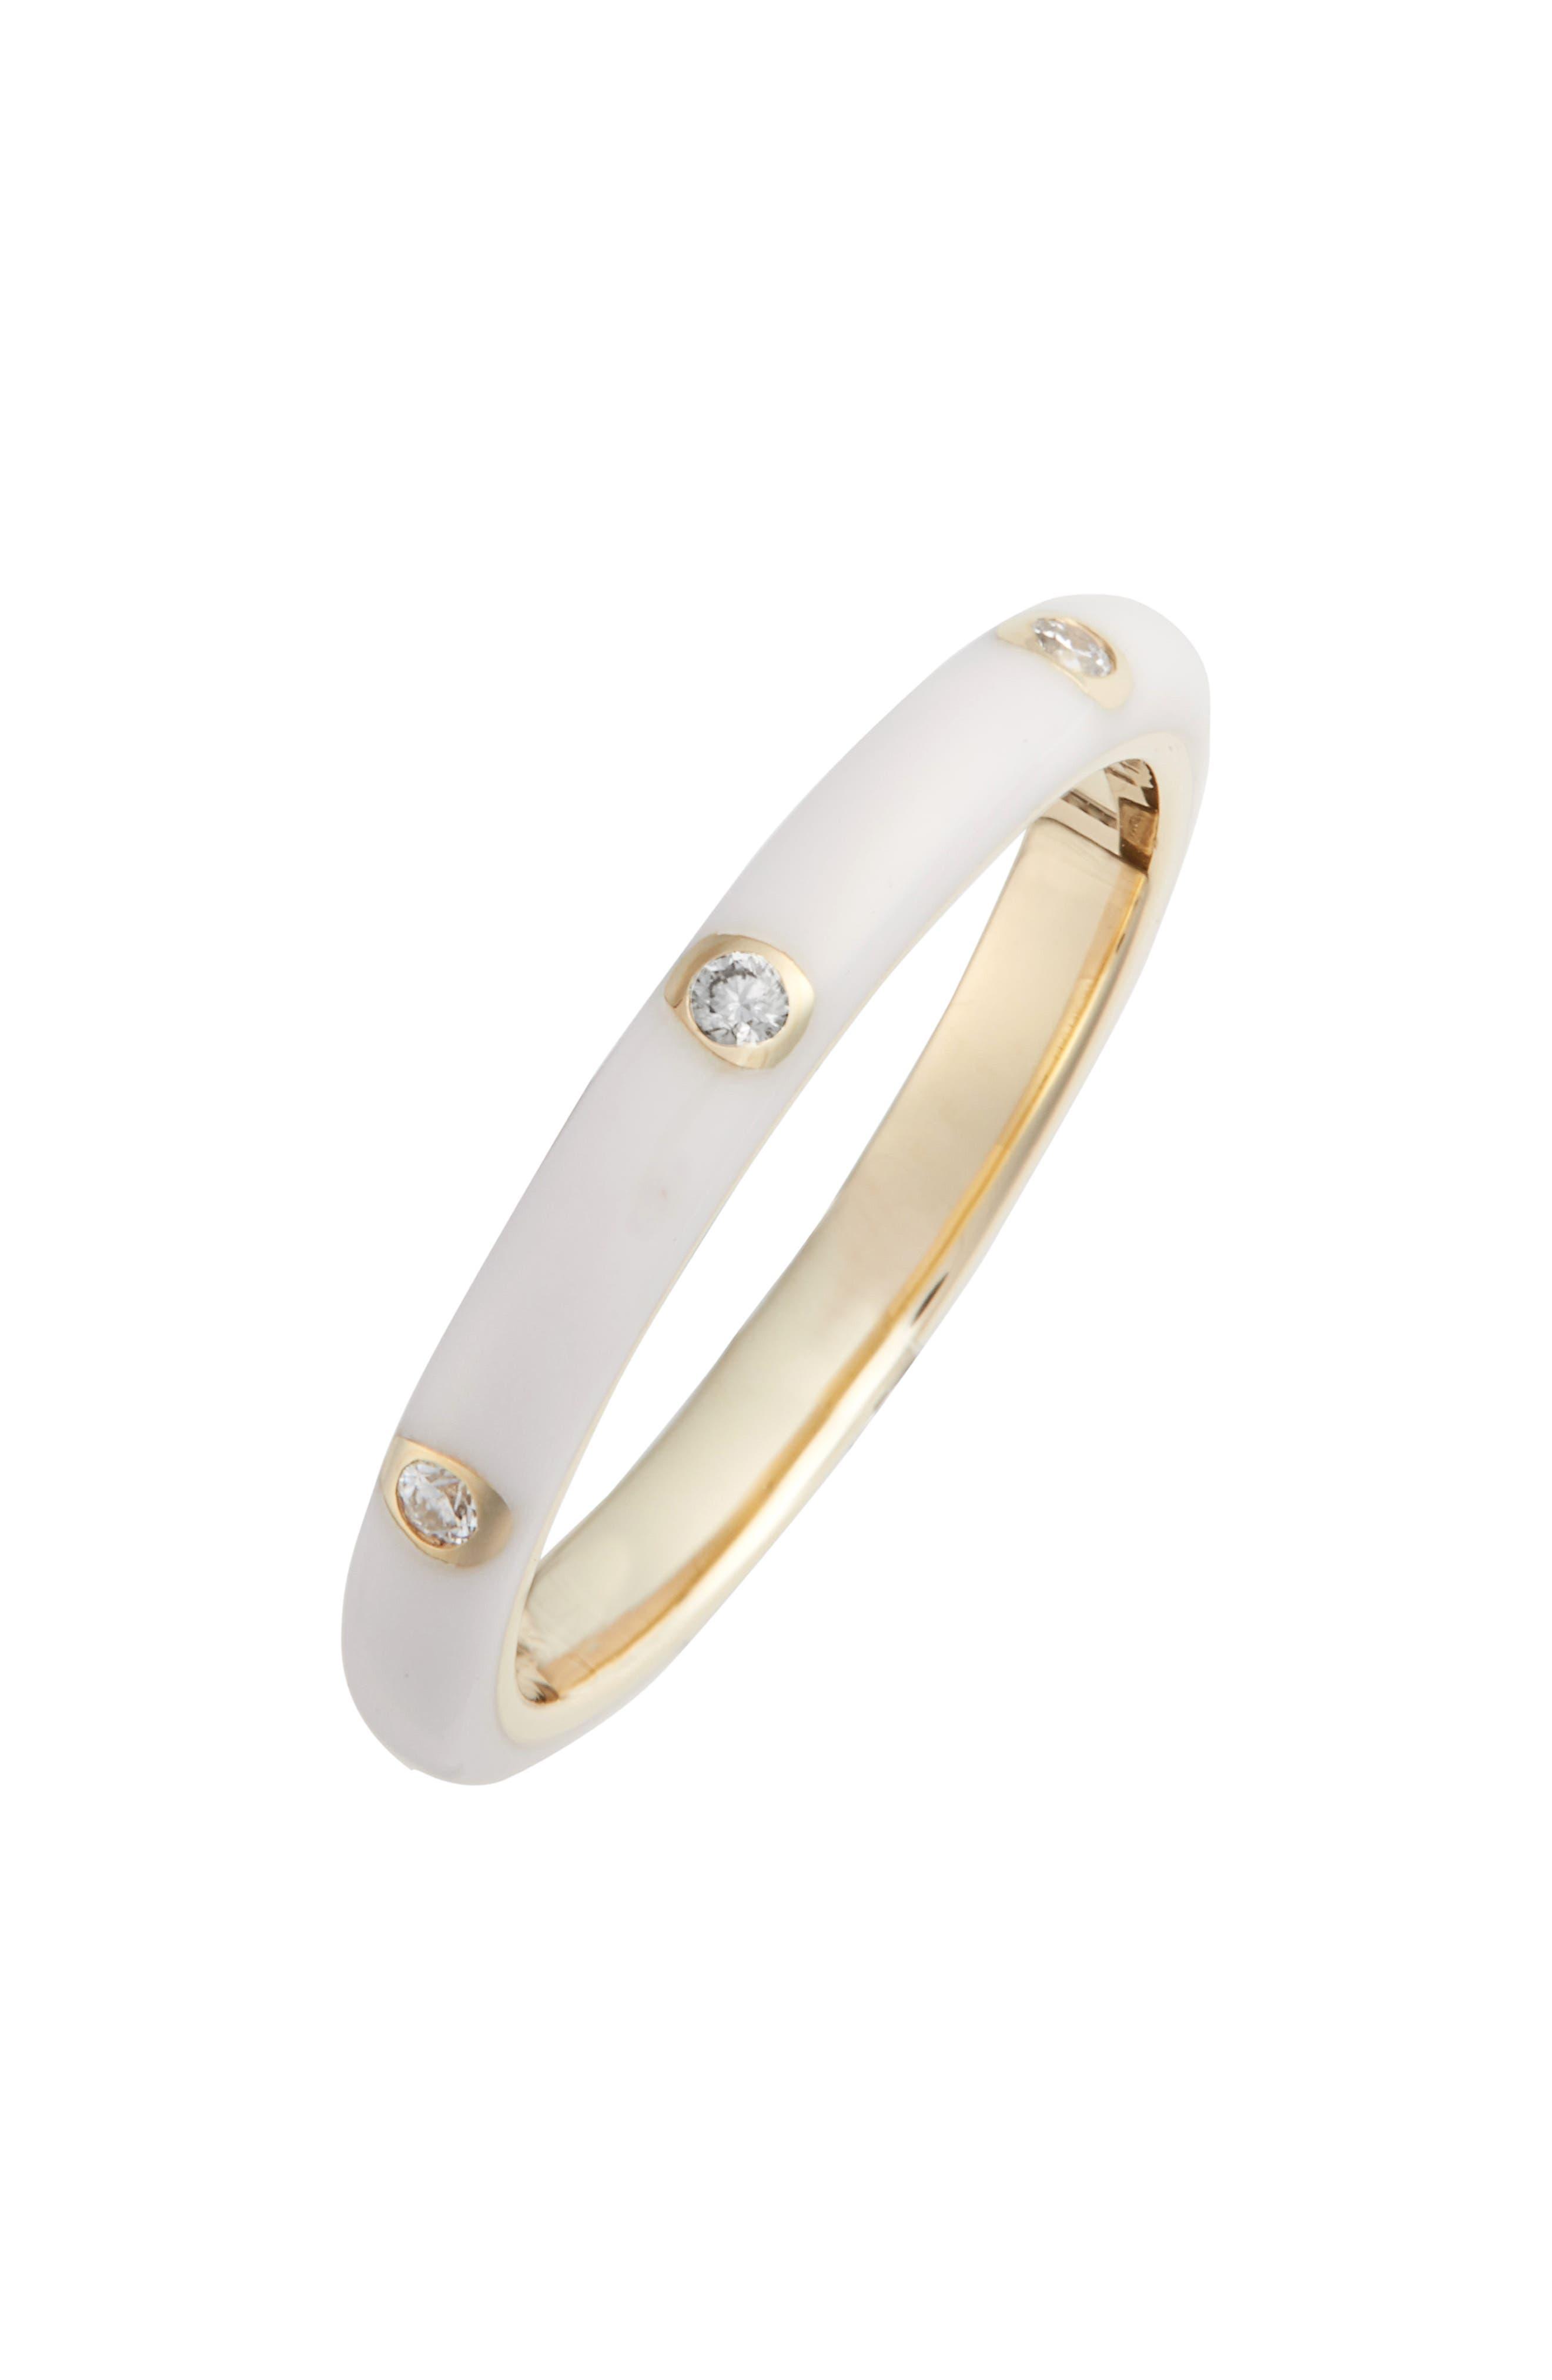 14K Yellow Gold & Three Diamond Enamel Stack Ring in Yellow Gold/ White